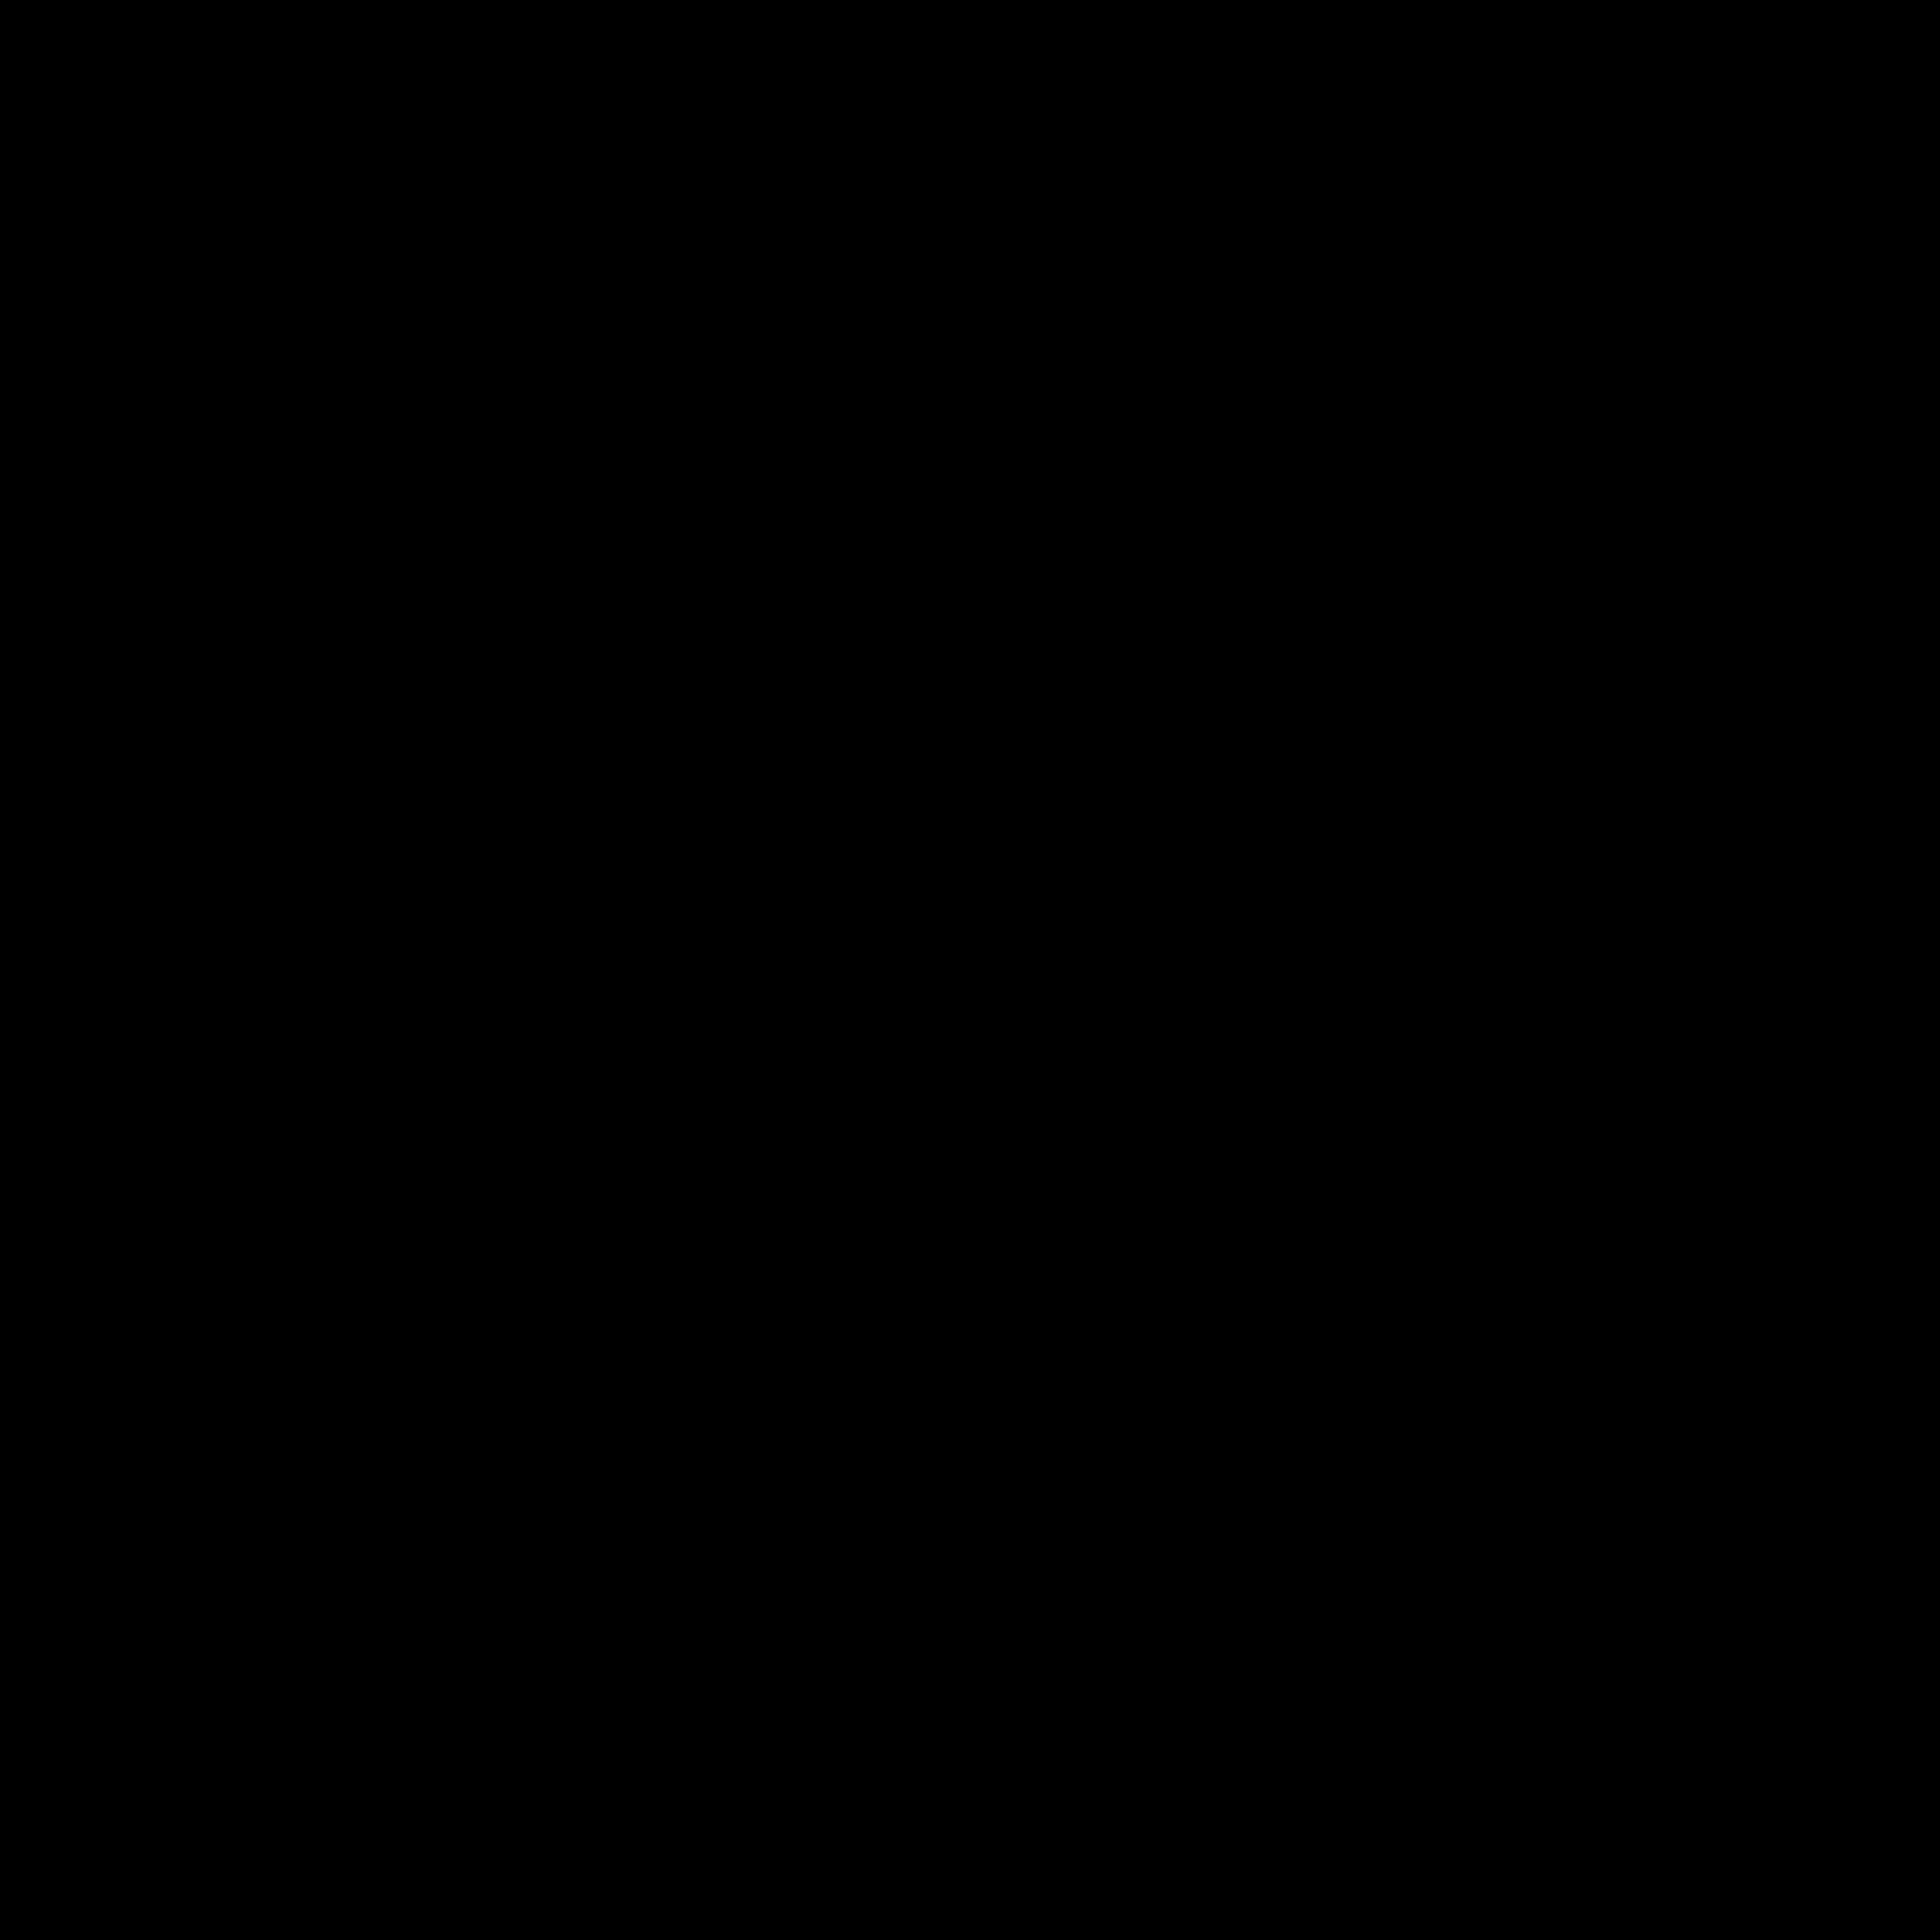 Revlon Logo Png Transparent & Svg Vector - Pluspng Pluspng.com - Revlon Logo PNG